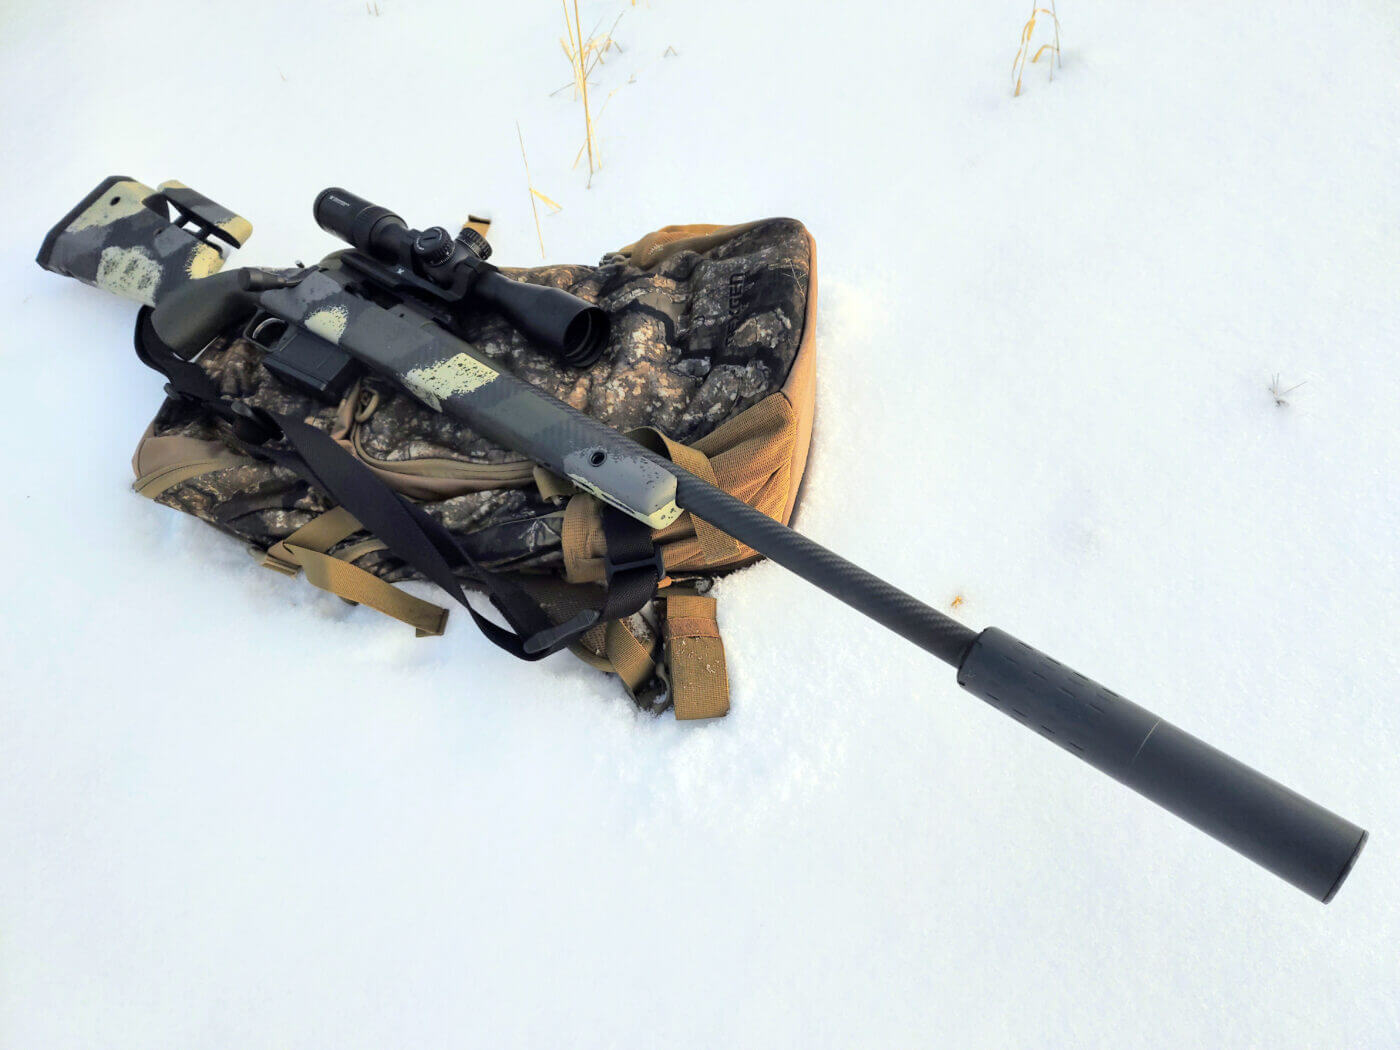 SilencerCo Hybrid 46 suppressor on Waypoint rifle